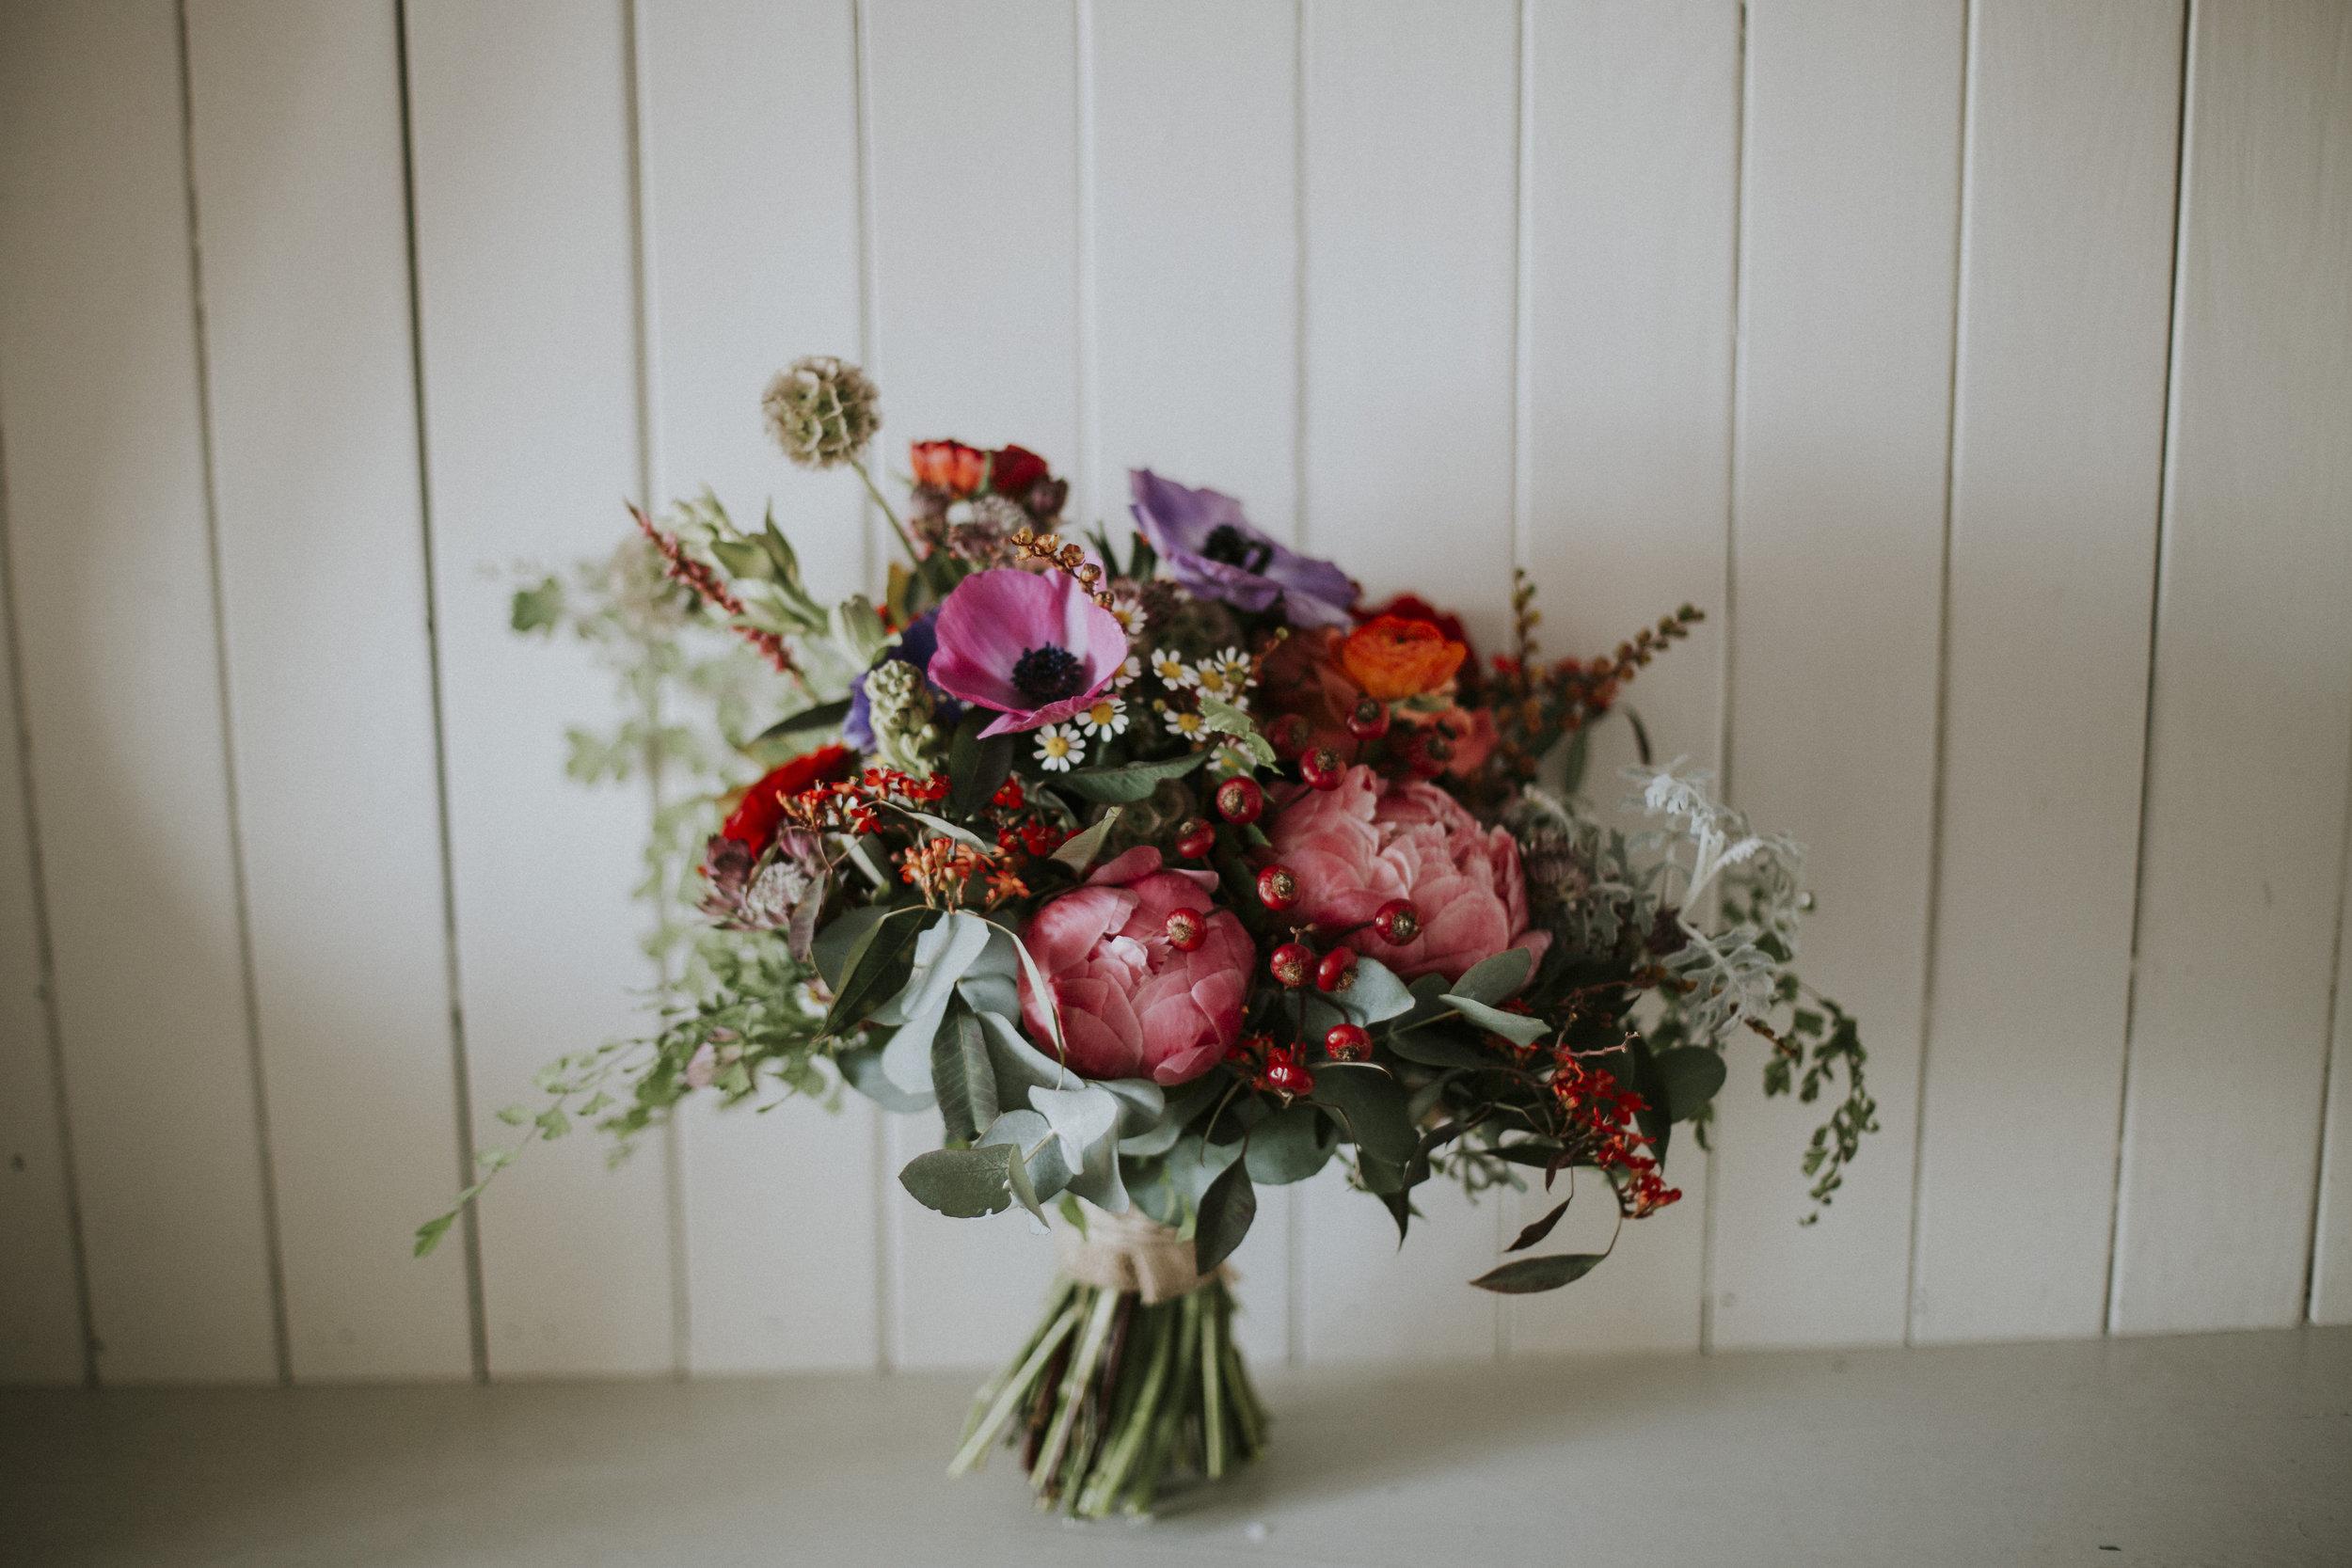 027_wedding_flowers_glasgow.jpg